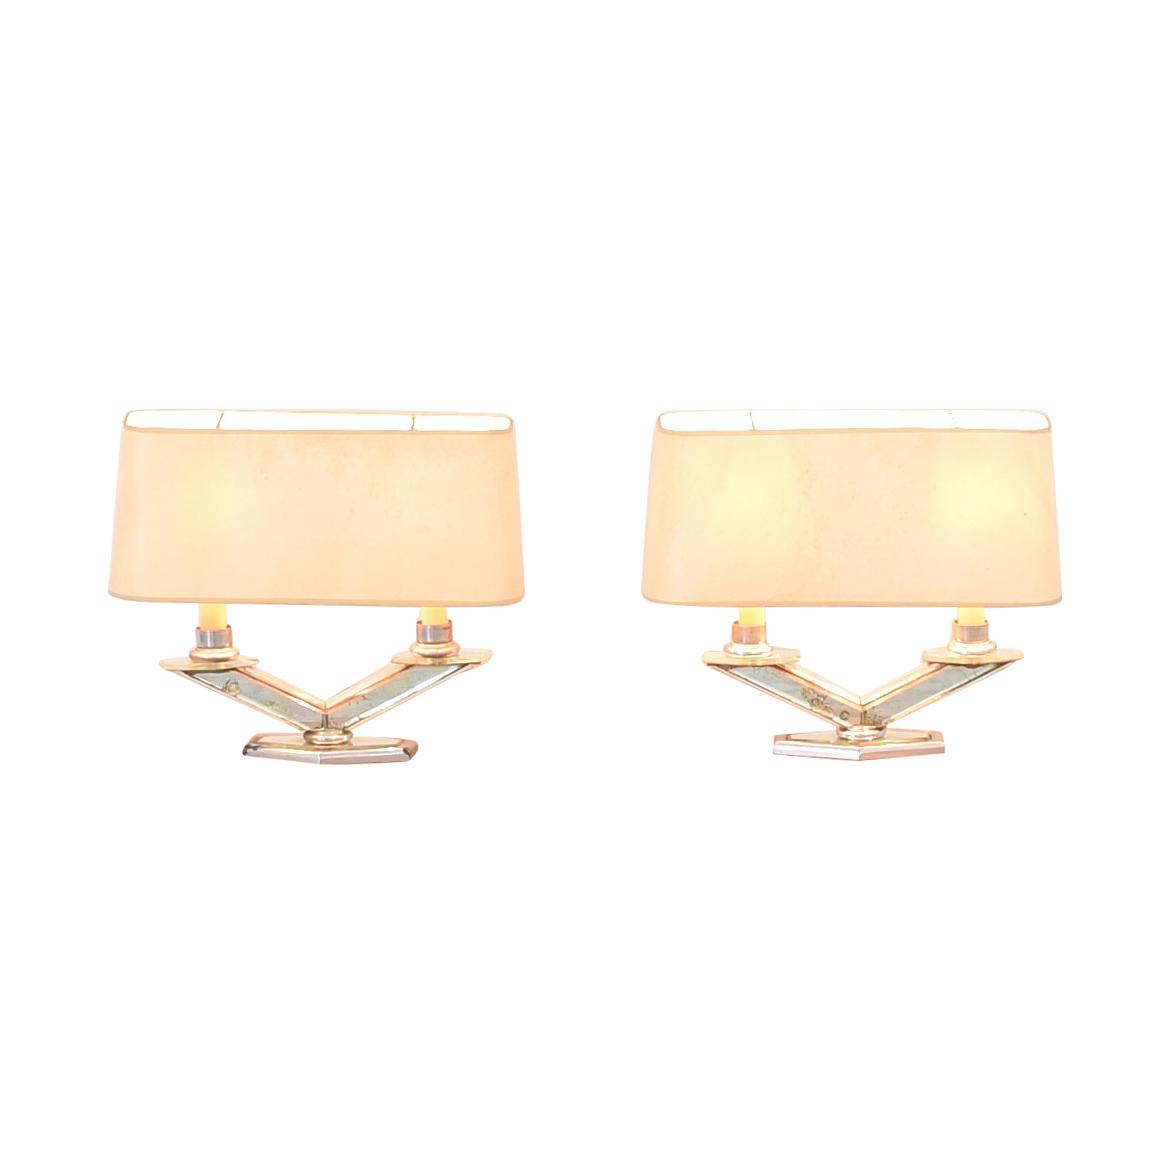 Vintage Style Table Lamps sale